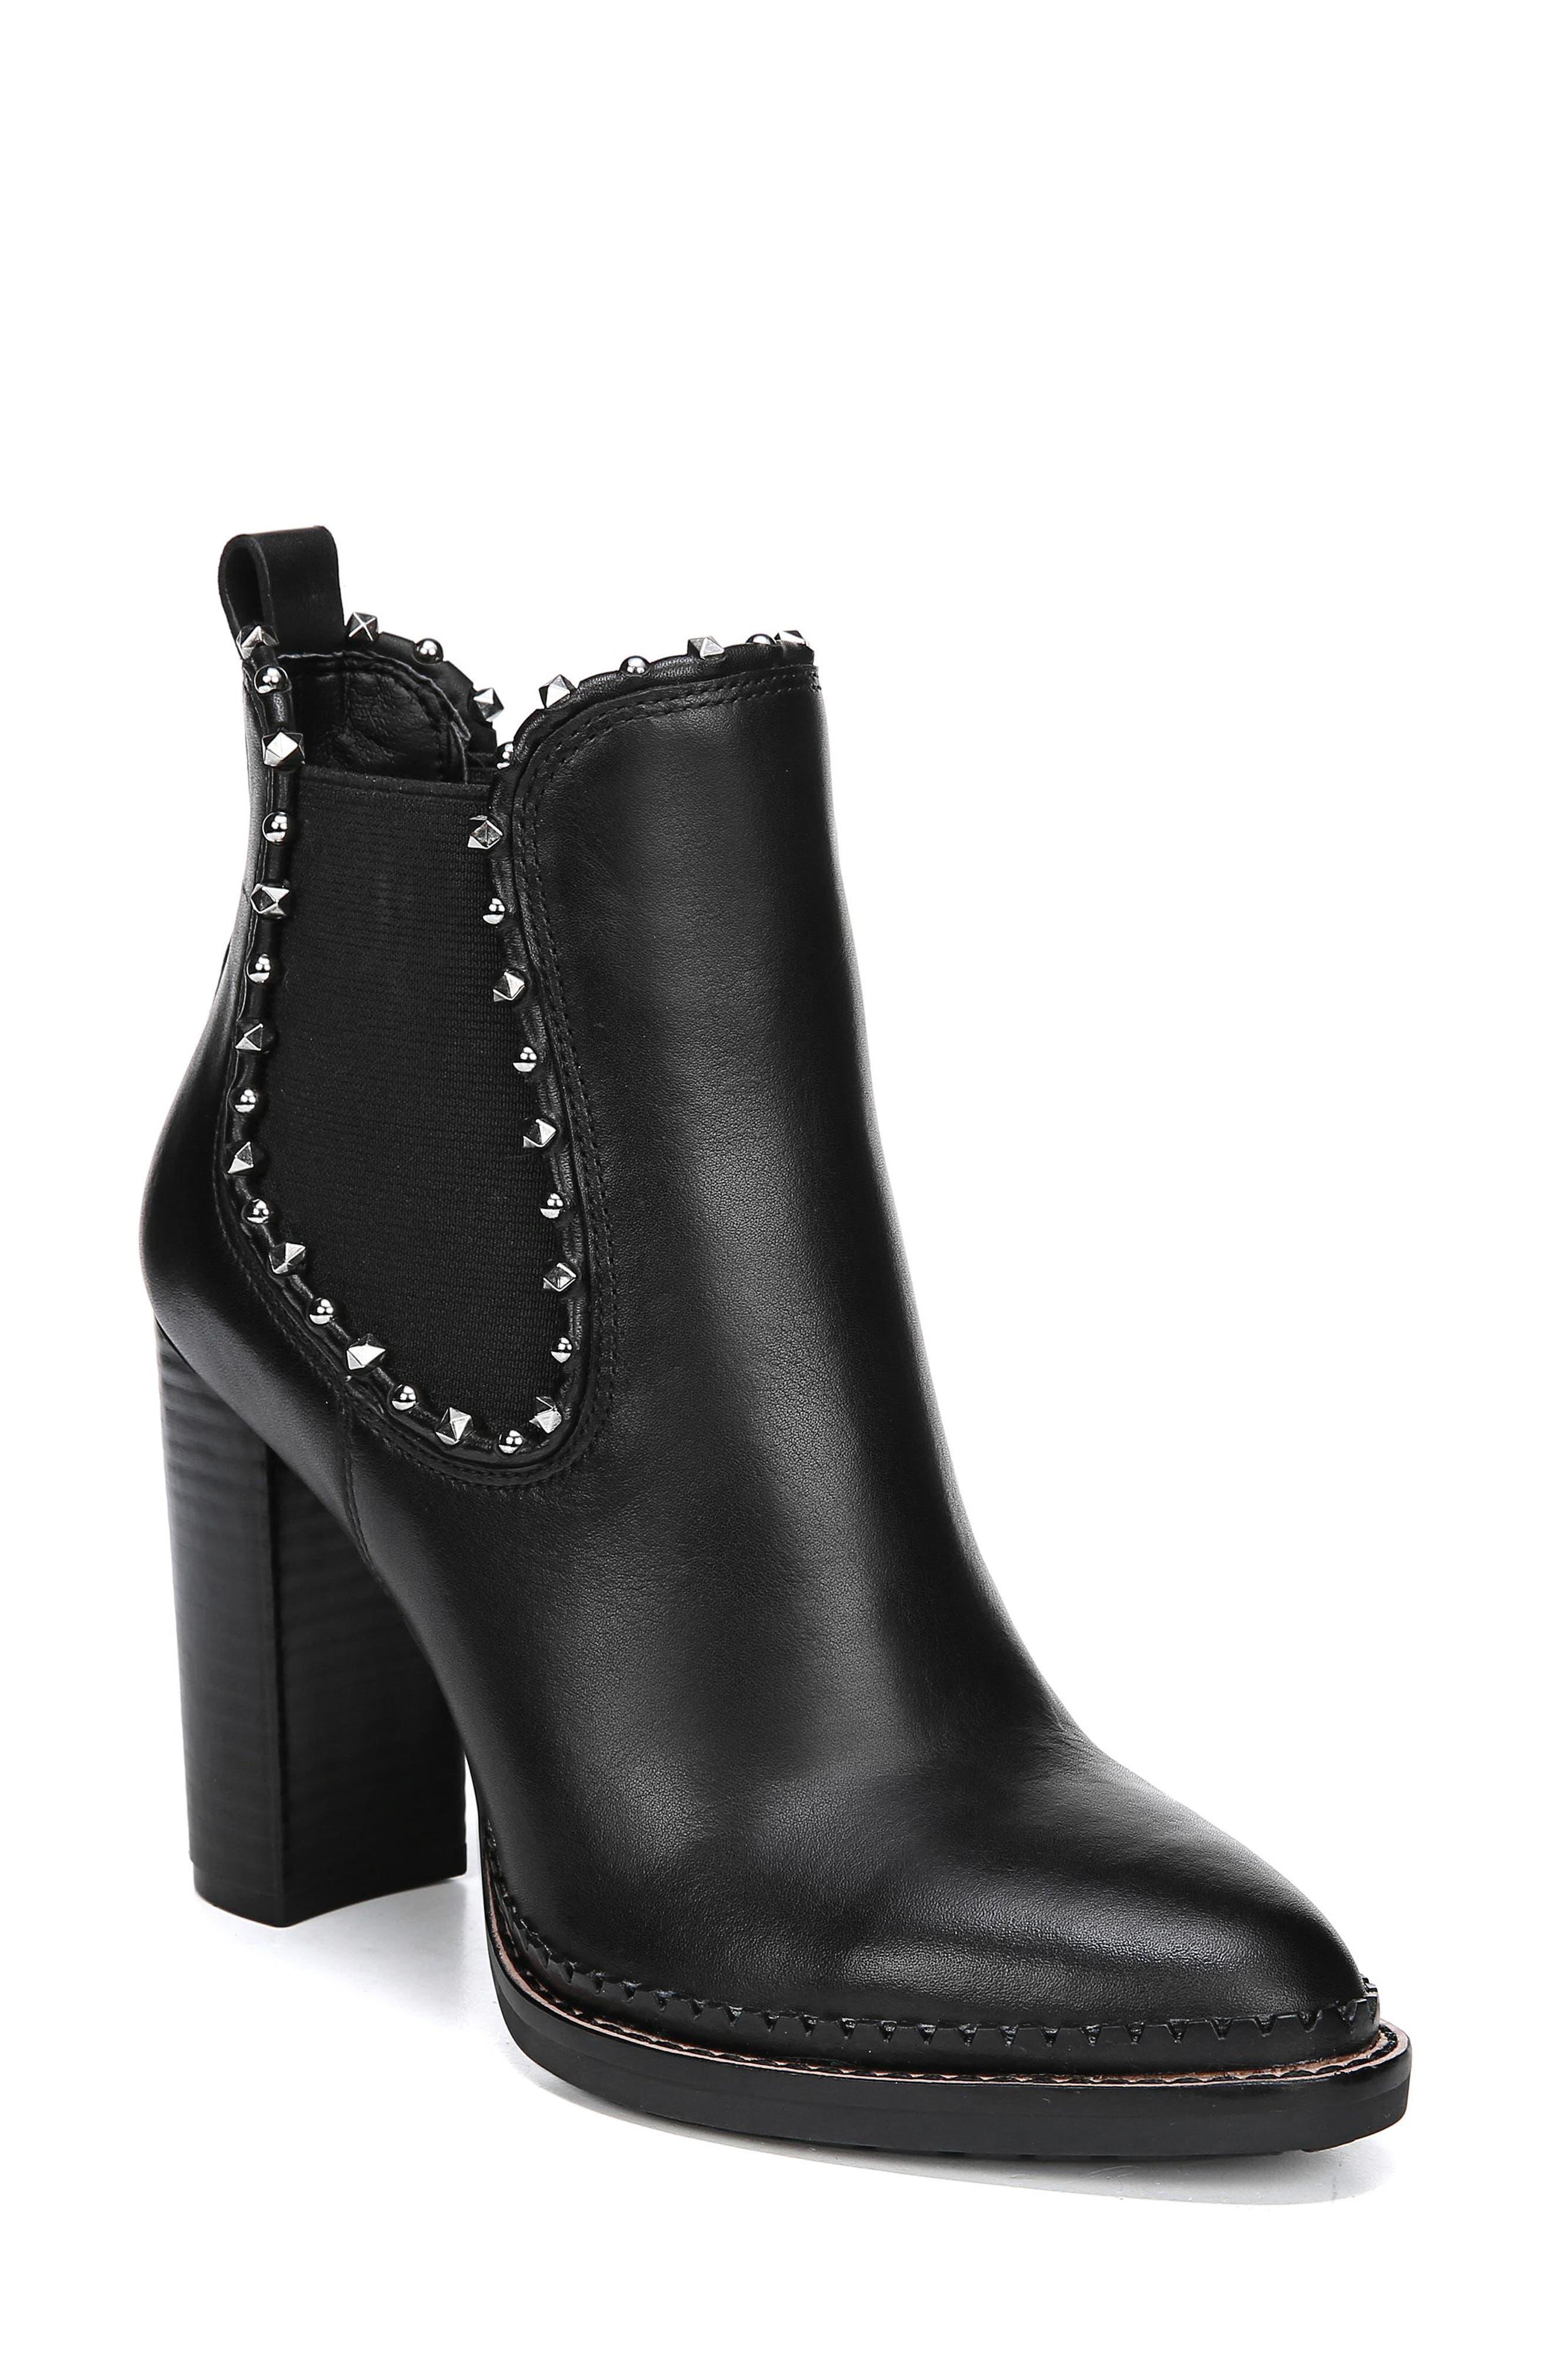 SAM EDELMAN Salma Studded Chelsea Boot, Main, color, 001